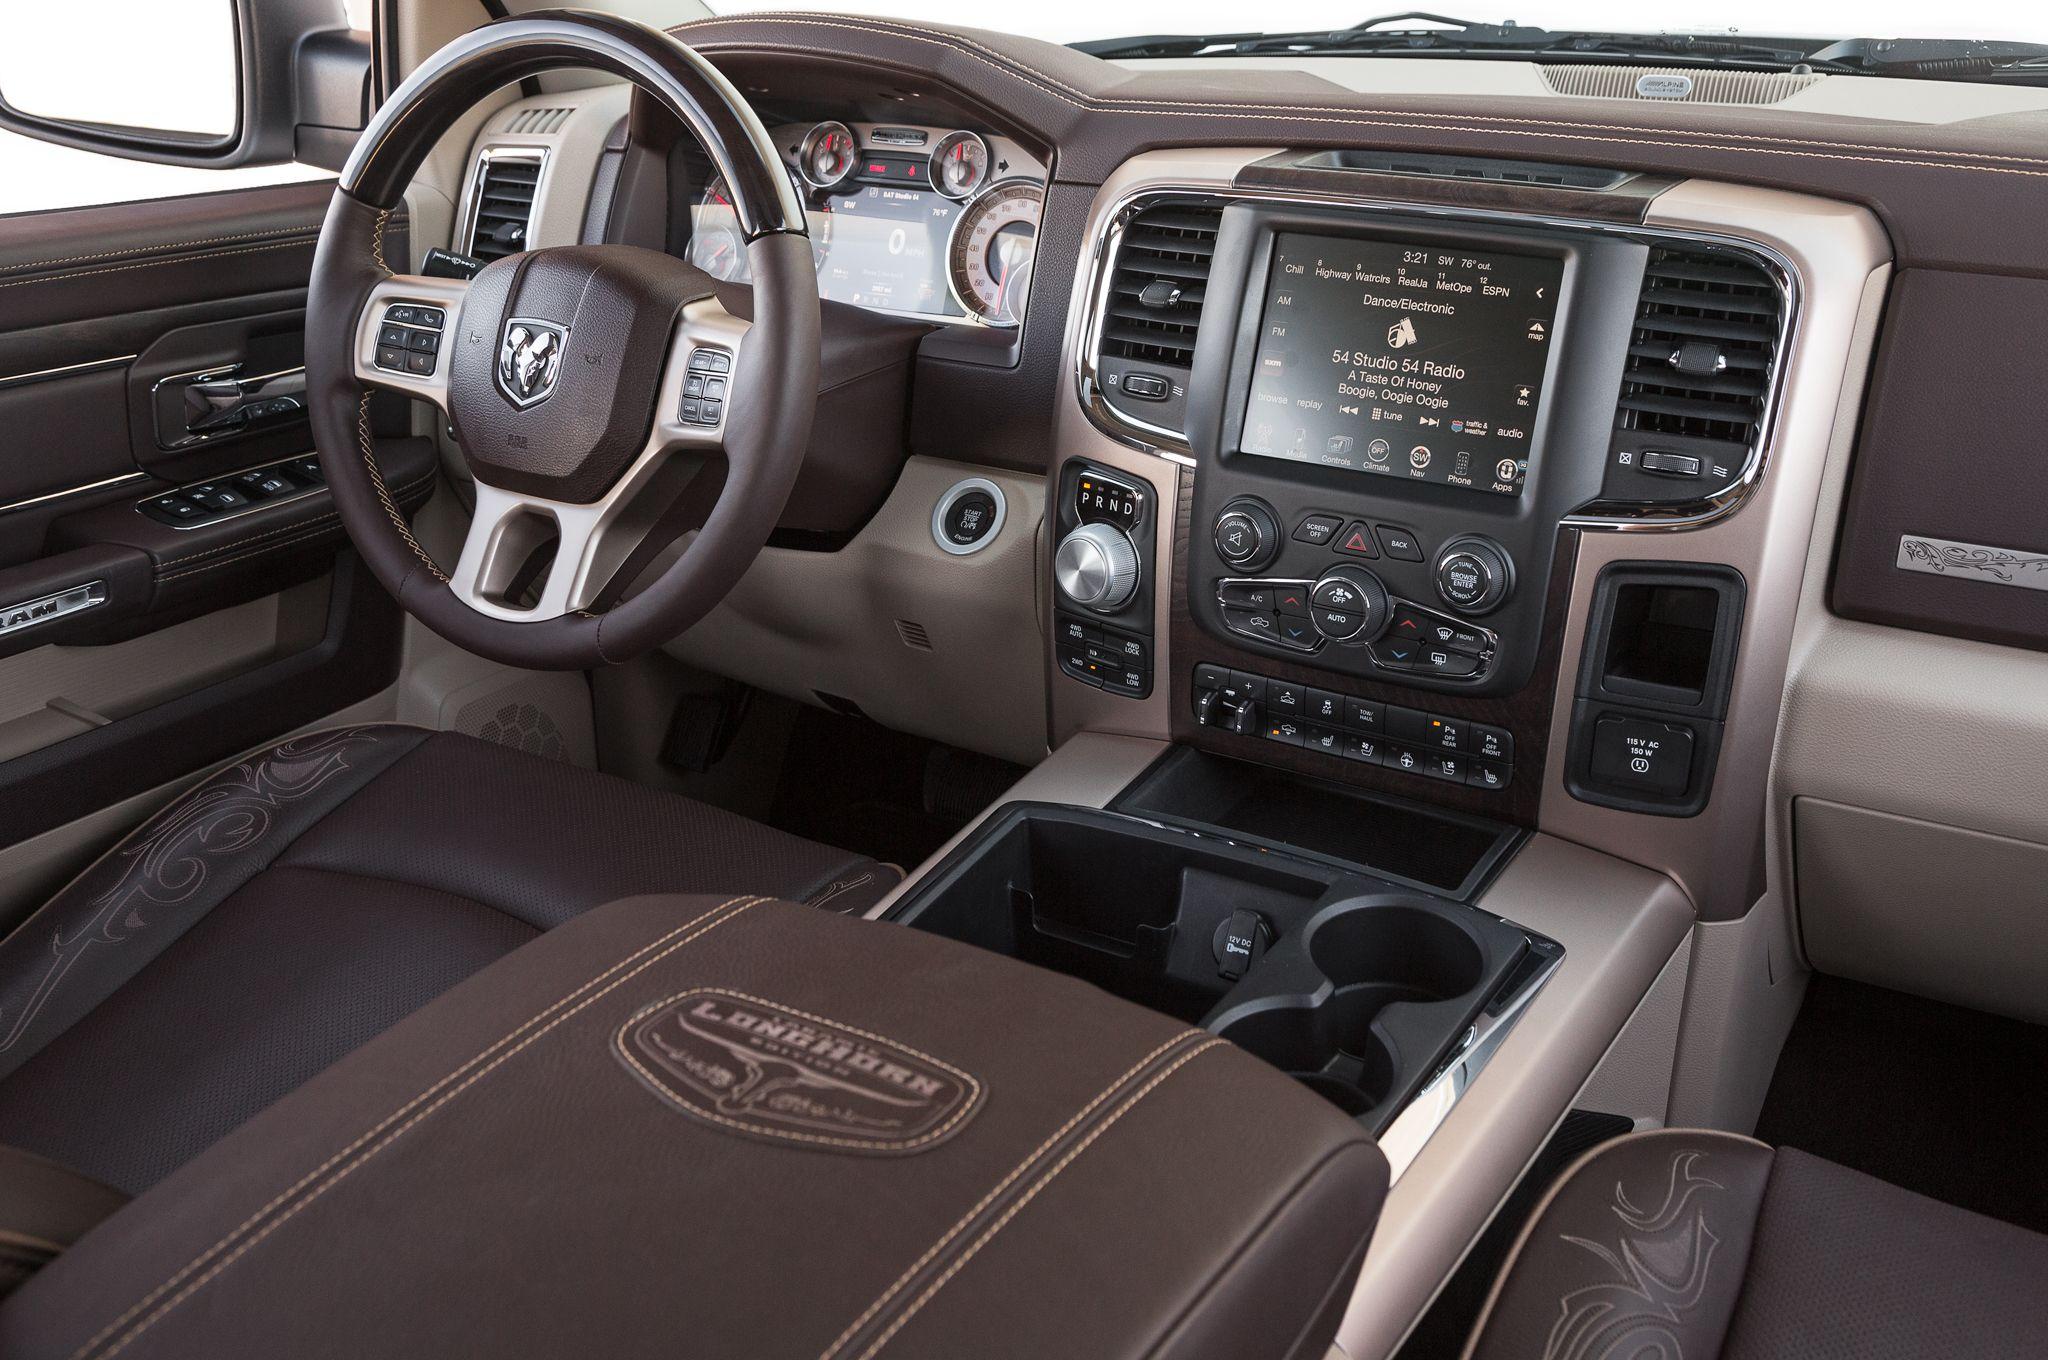 2018 Dodge Ram 1500 Engine And Price Noorcars Com